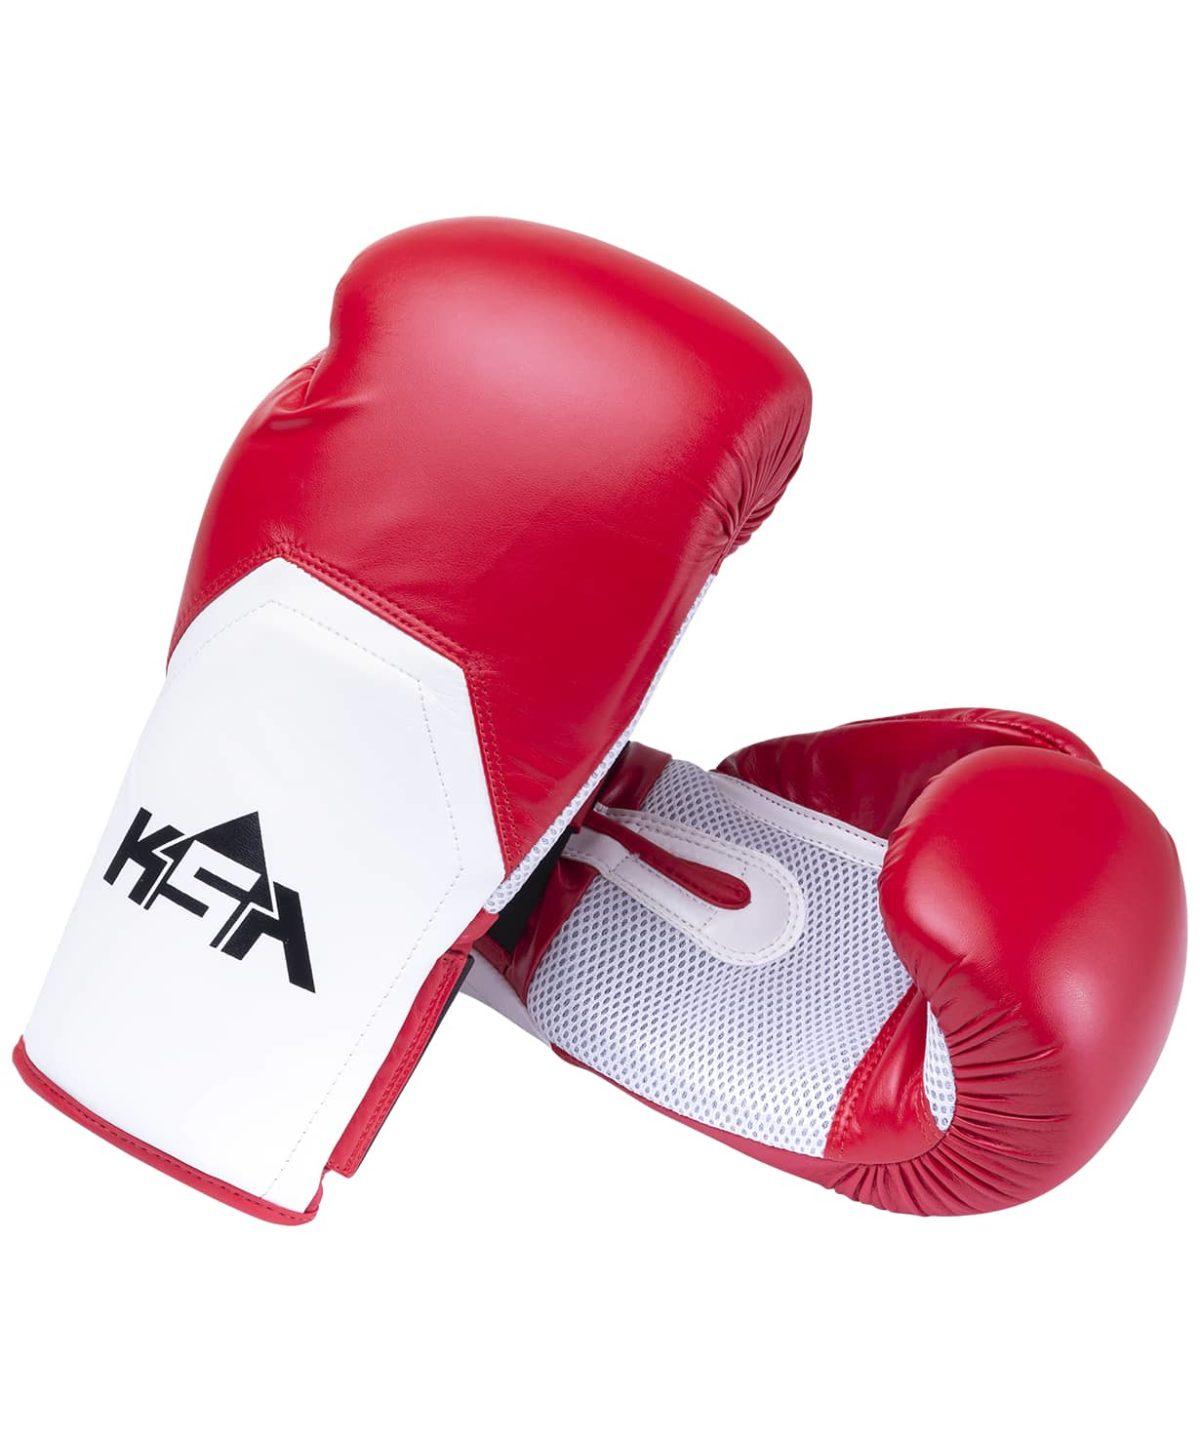 KSA Персатки боксерские, 8 oz, к/з Scorpio  17823 - 1